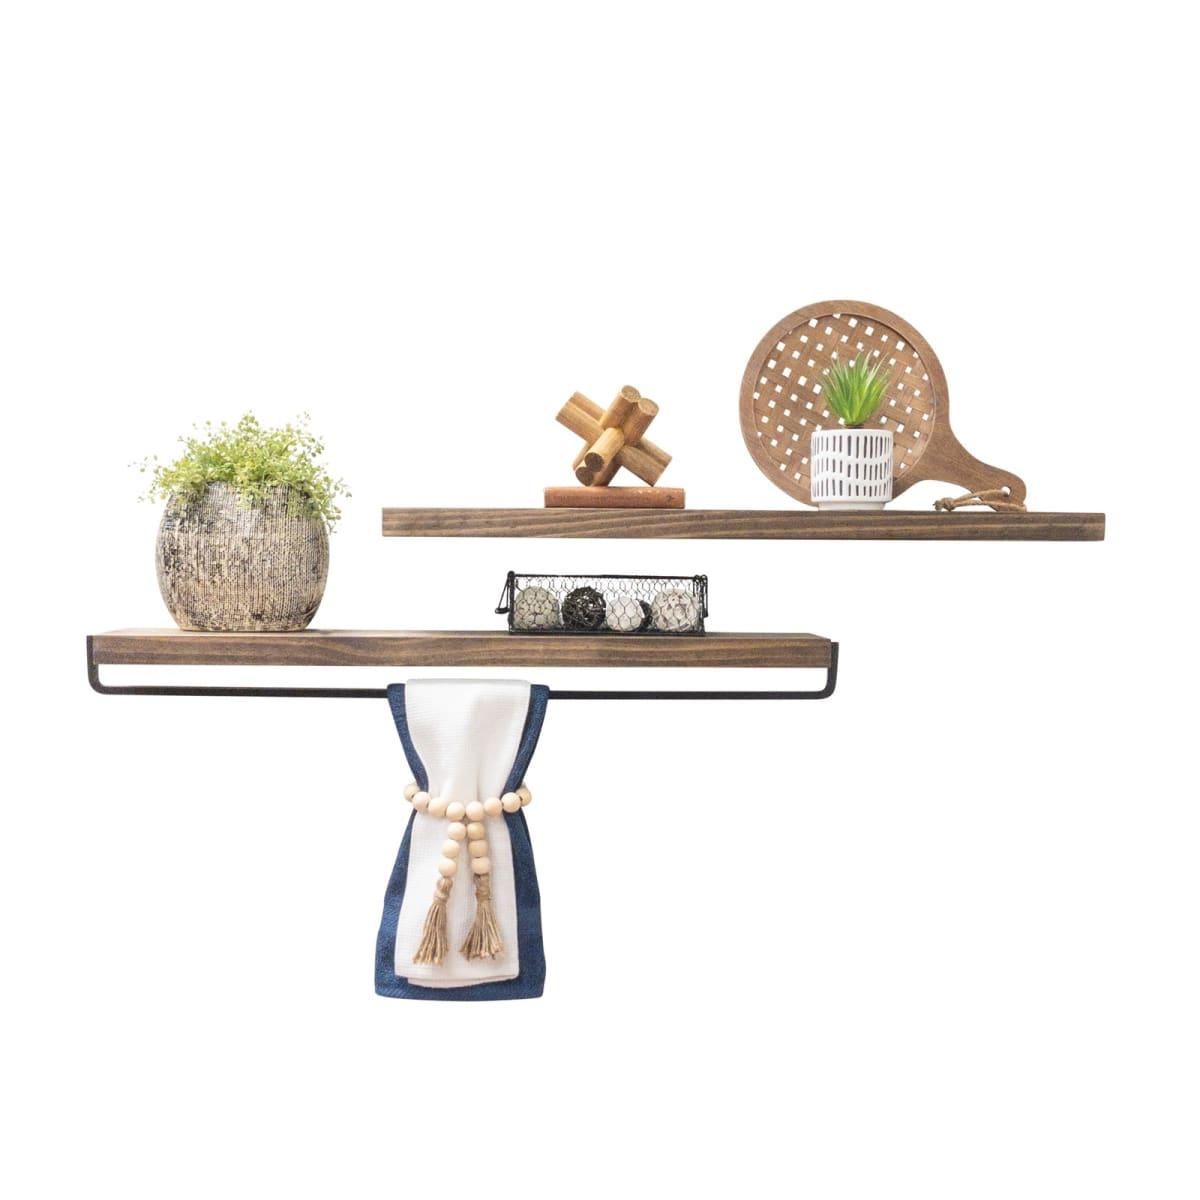 Del Hutson Designs True Floating Shelf and Towel Set